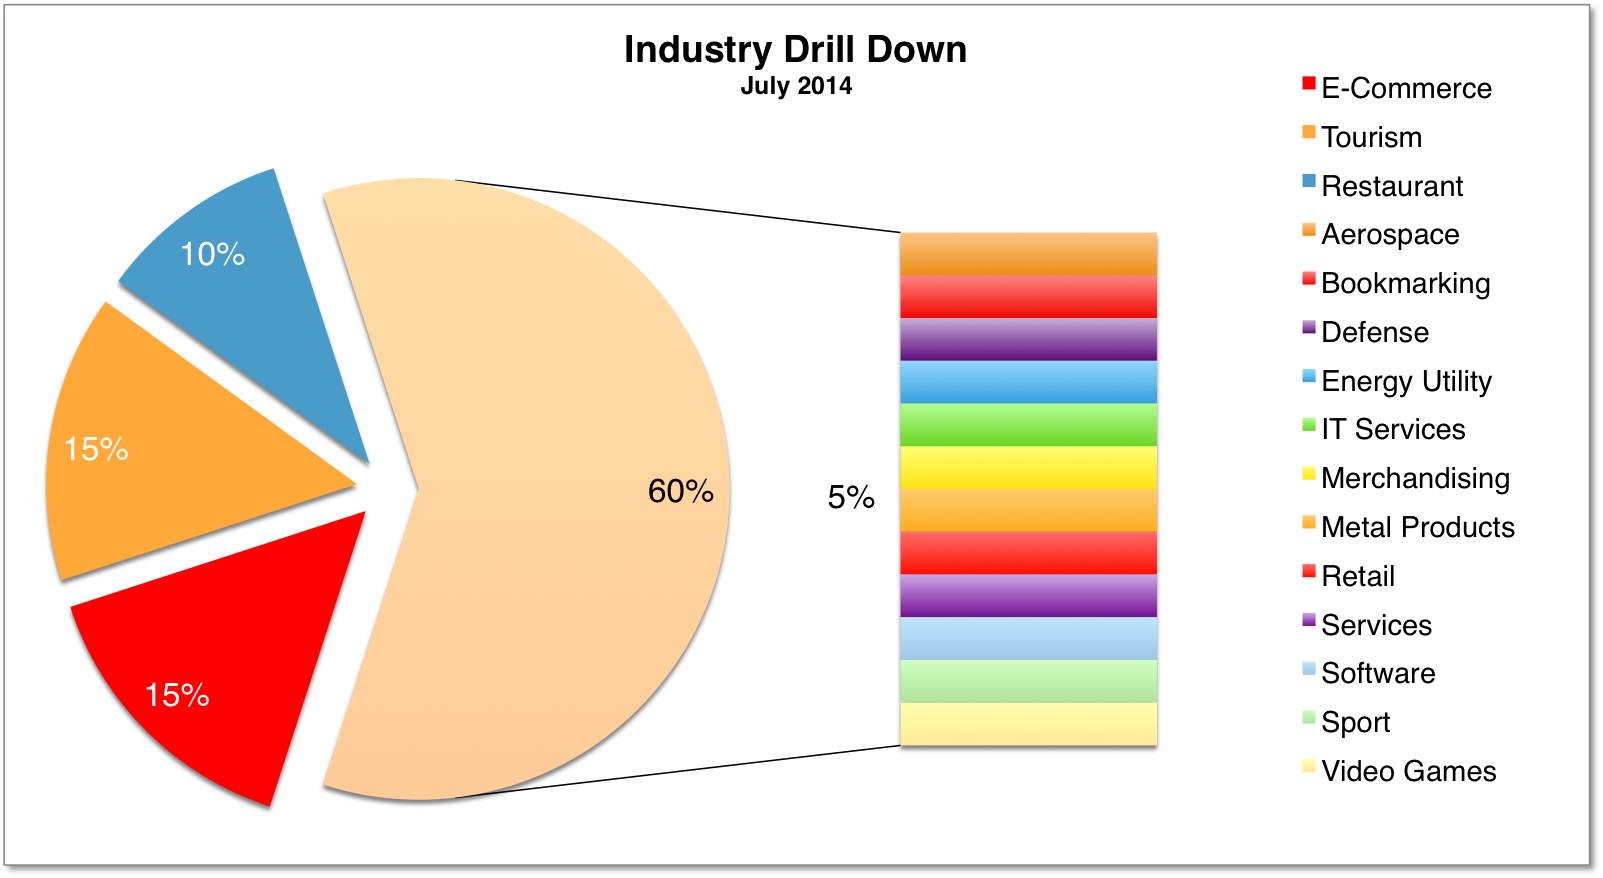 Industry Drilldown 2014